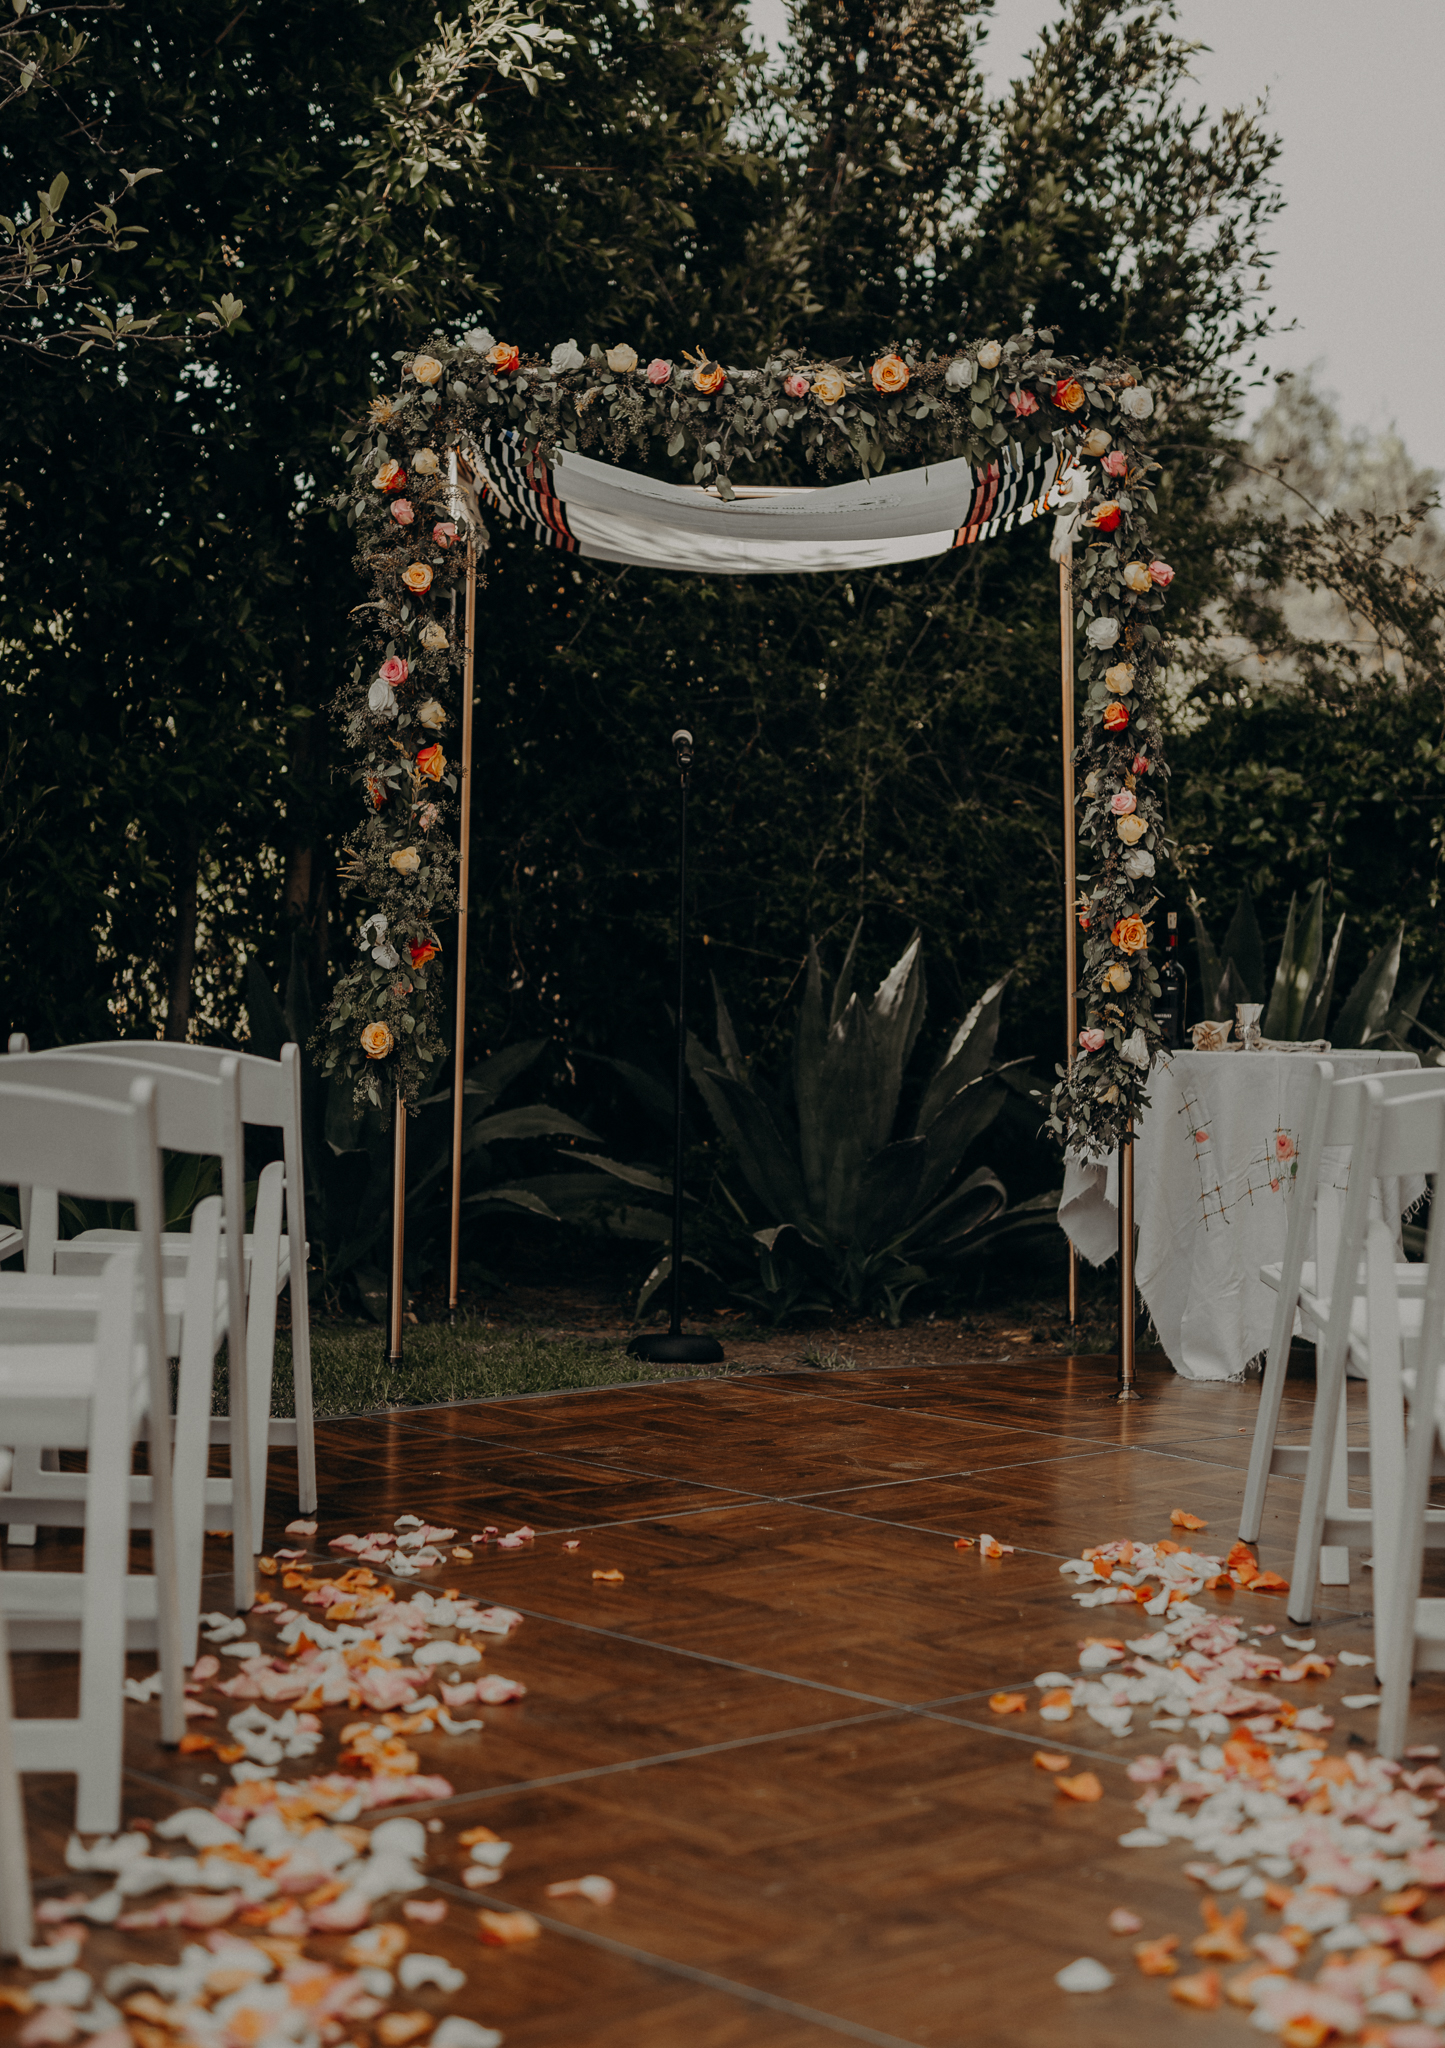 Isaiah + Taylor Photography - Private Estate Backyard Wedding - Beverly Hills - Los Angeles Wedding Photographer - 64.jpg